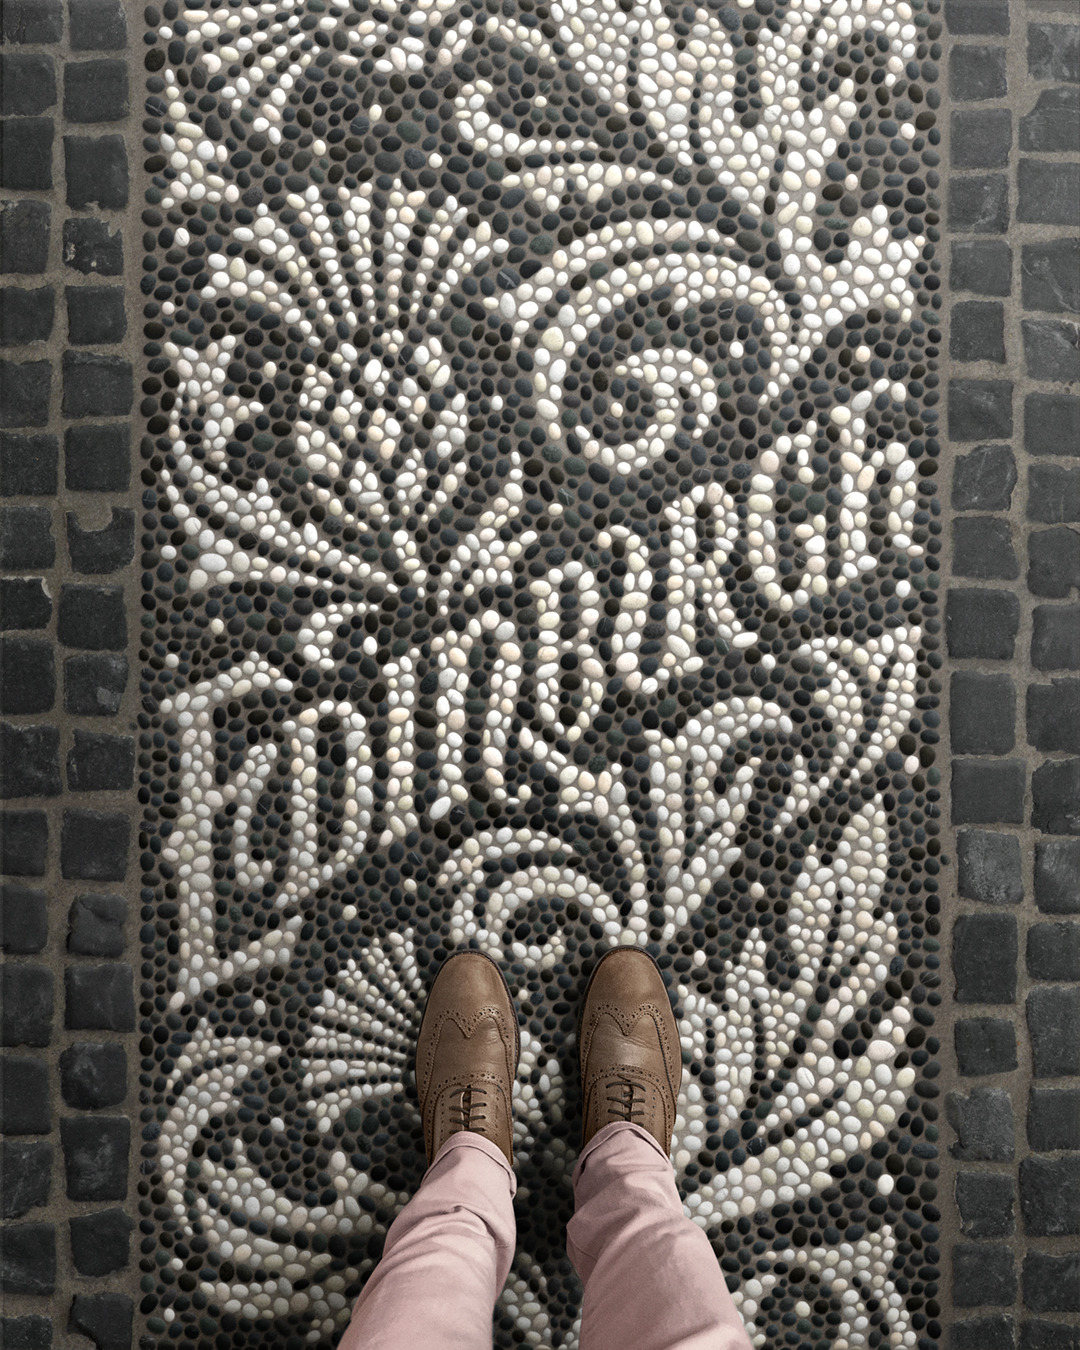 Typografie, Typographic mosaic illustrations by Nick Misani